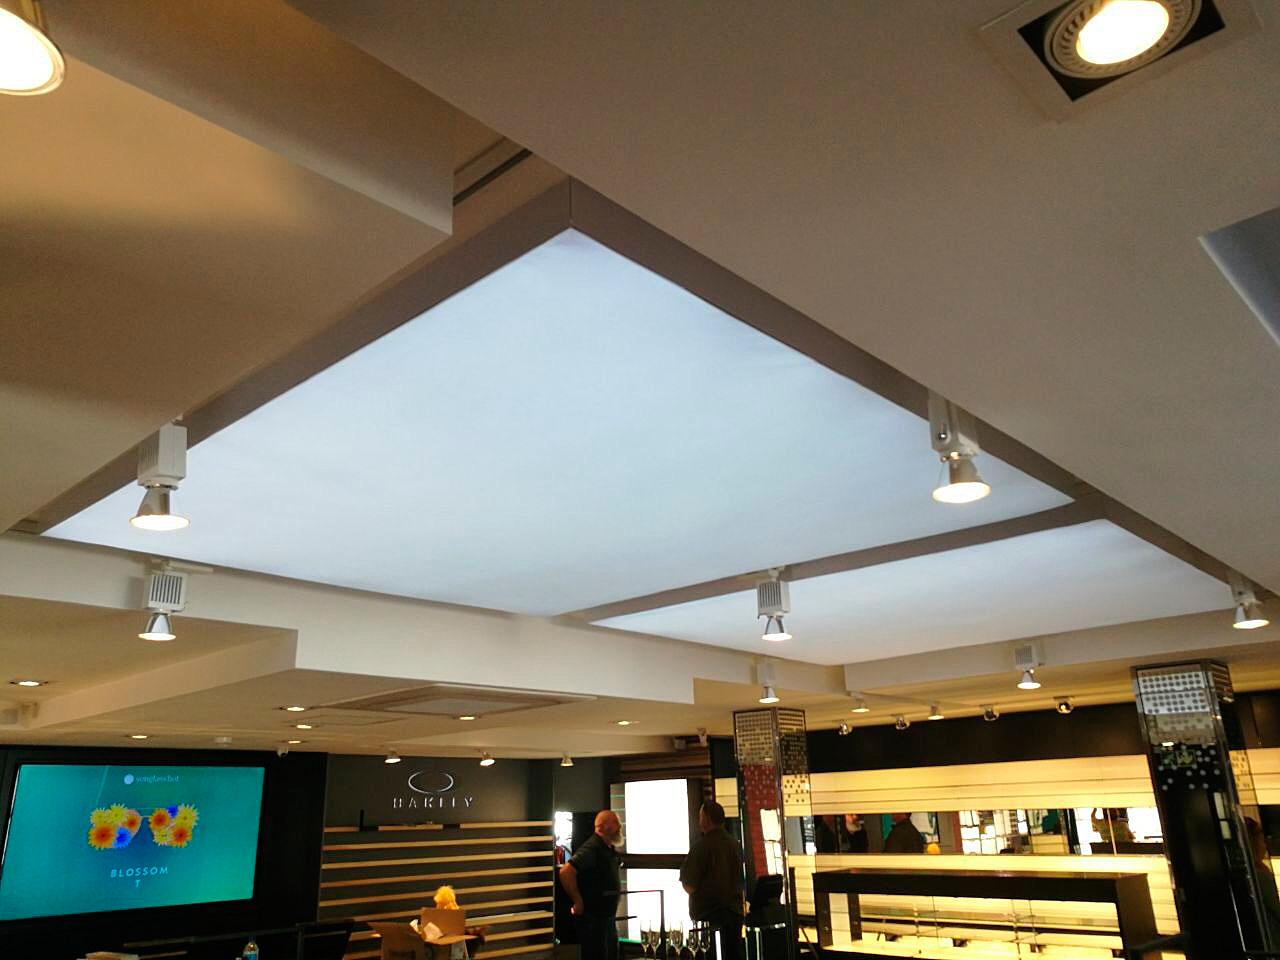 Flash Ceiling light box